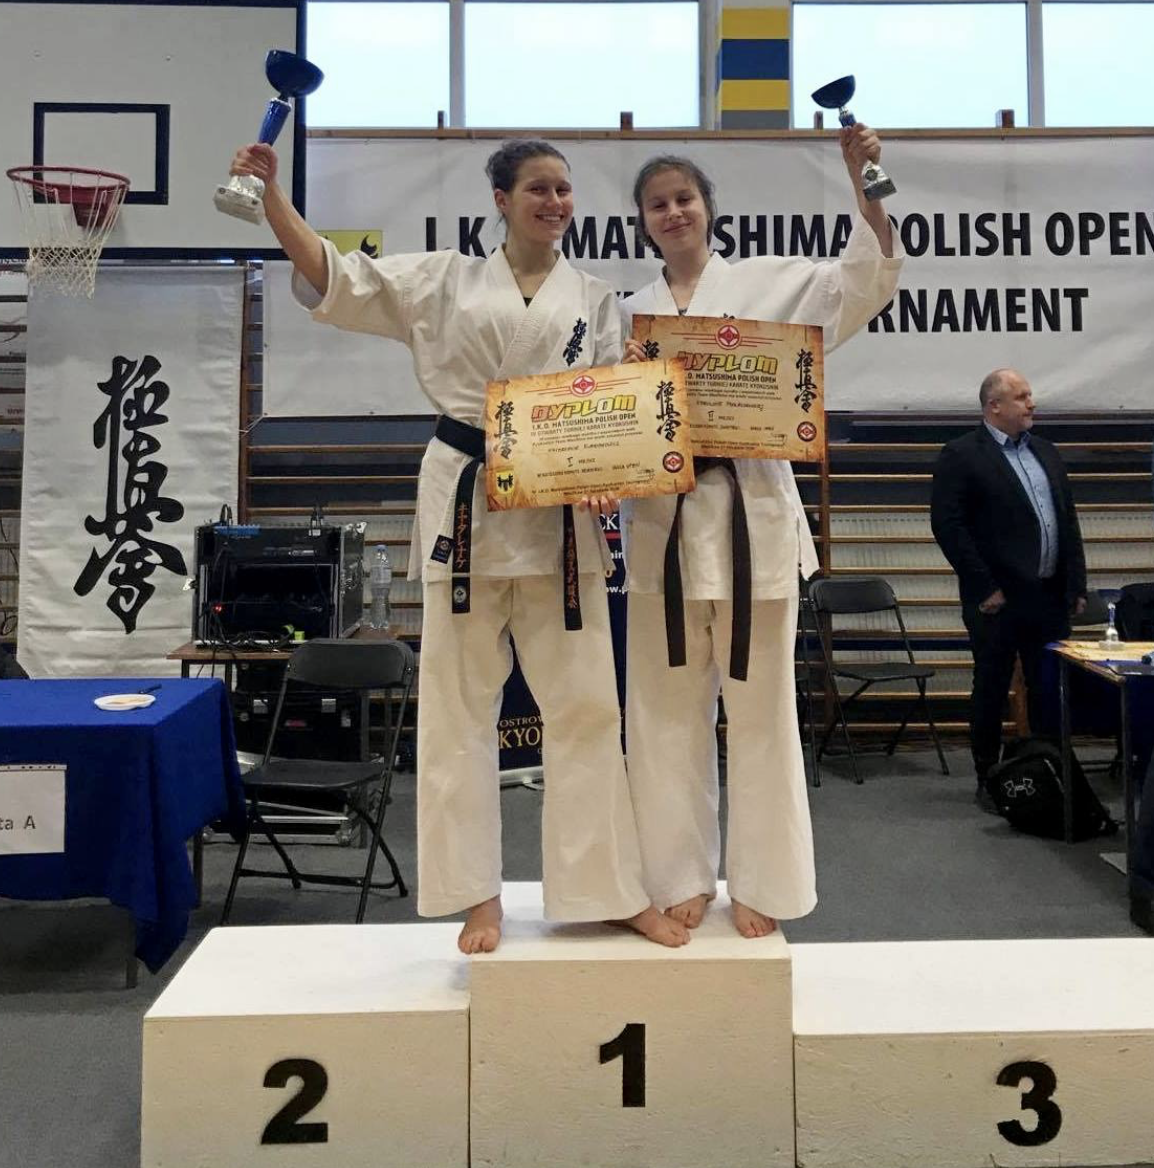 IKO Matsushima Polish Open